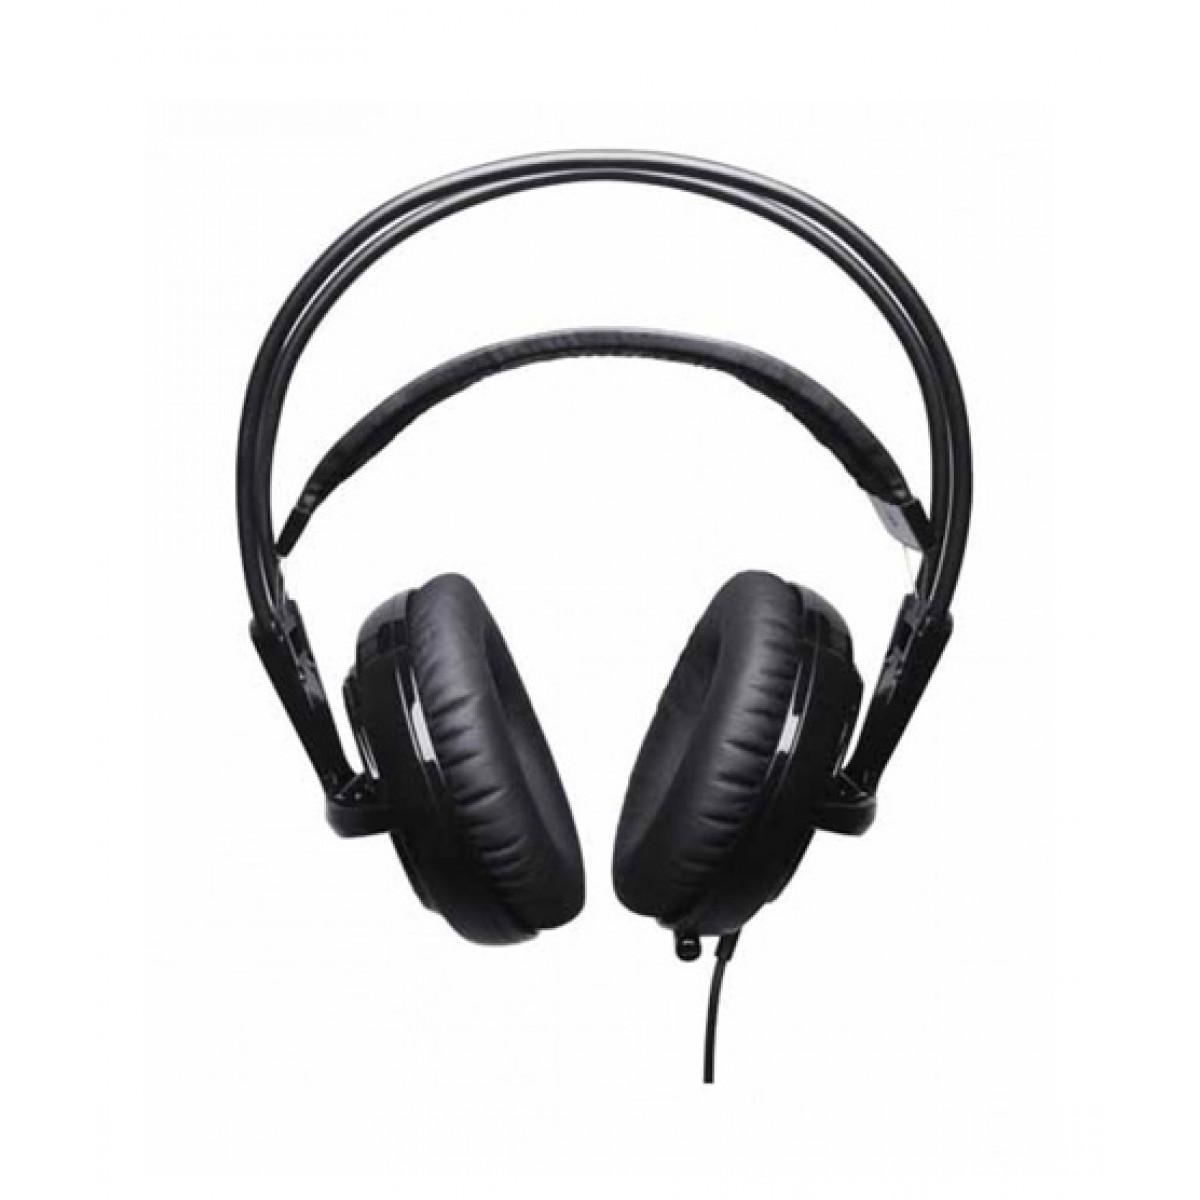 51aba443c5b SteelSeries V2 USB Gaming Headset Price in Pakistan   Buy SteelSeries  Over-Ear Headset Black   iShopping.pk